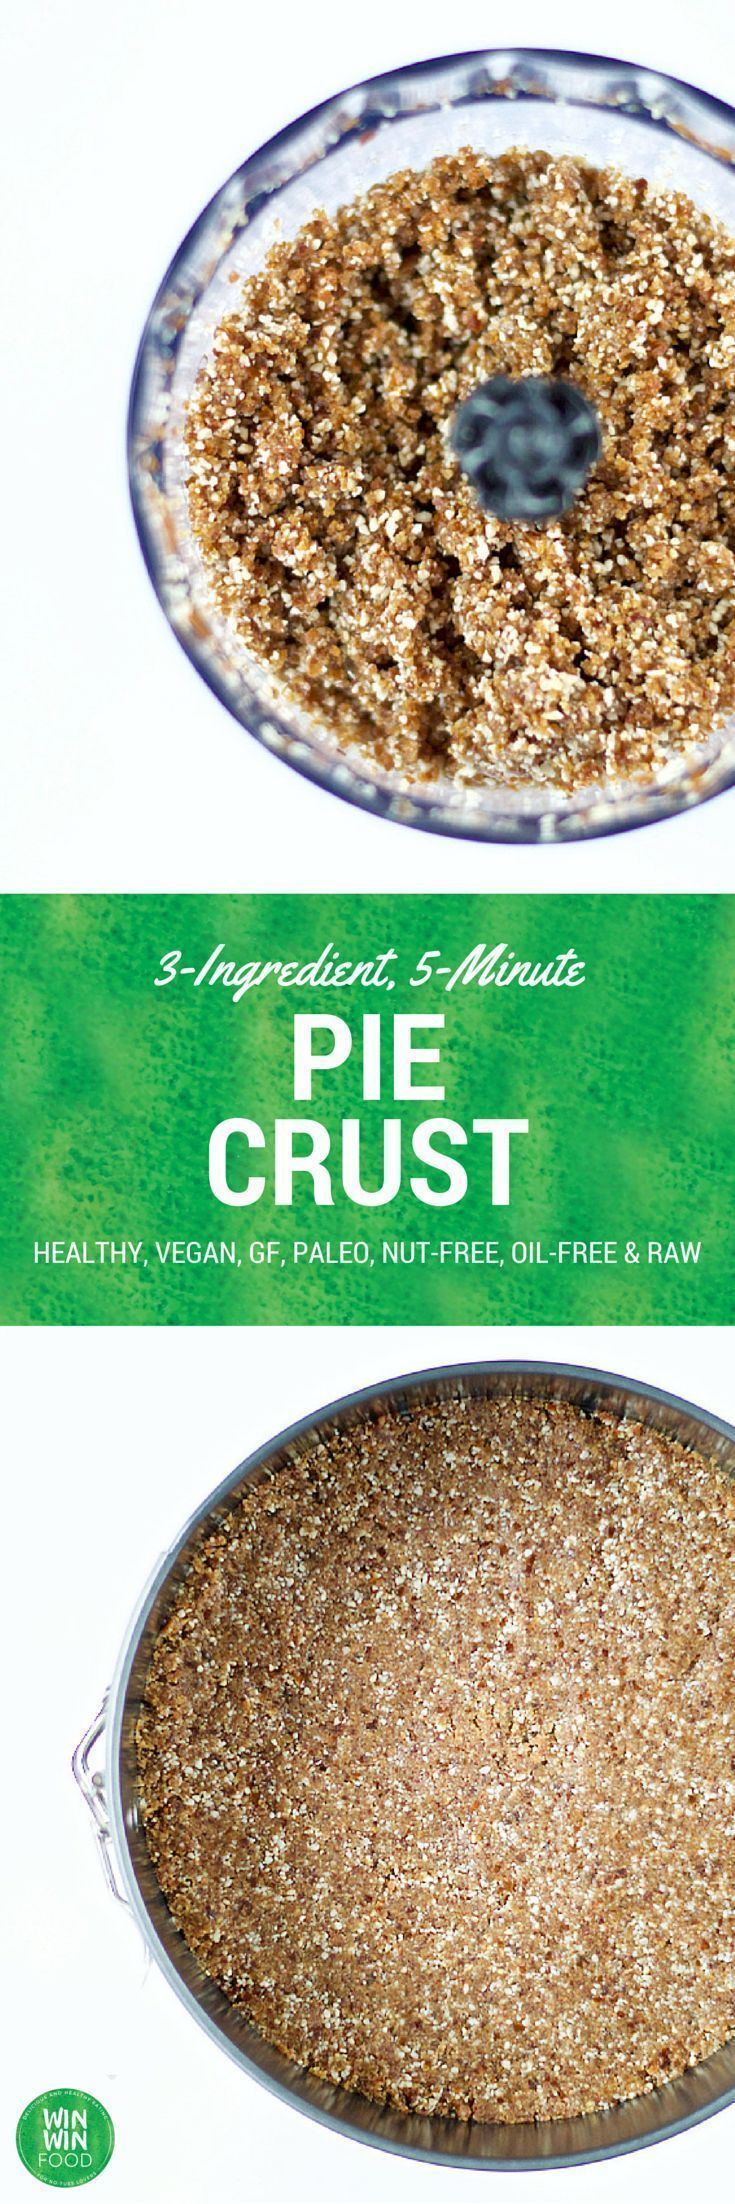 3-Ingredient, 5-Minute, Nut-Free Paleo Pie Crust   WIN-WINFOOD.com #healthy #vegan #raw #paleo #glutenfree #nutfree #oilfree